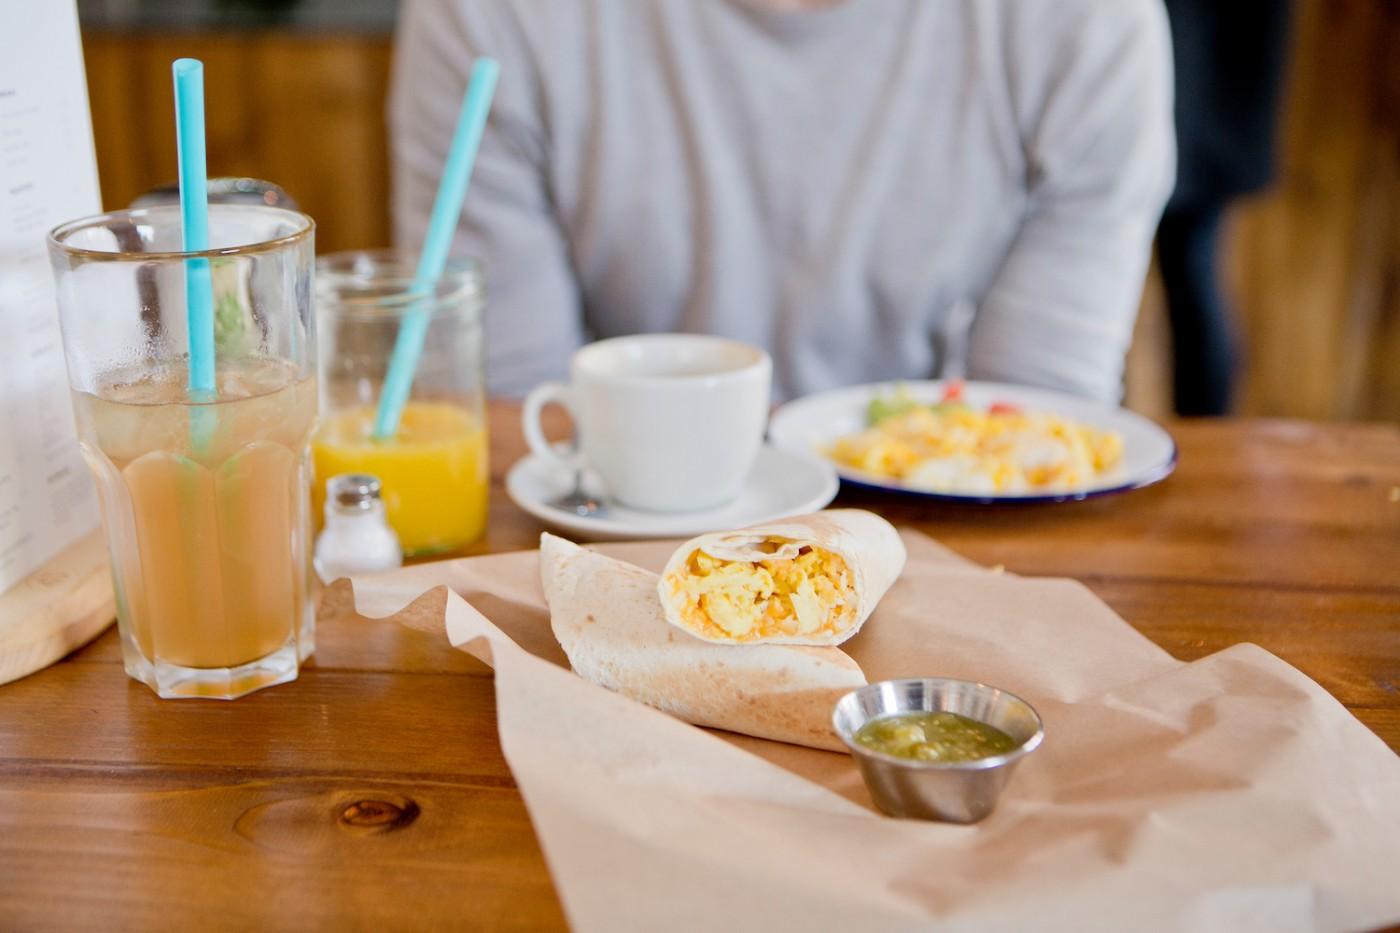 LAX Eatery, Breakfast in Munich, Restaurants in Munich, Restaurants in München, Essen in München Eating in Munich, Munich Food